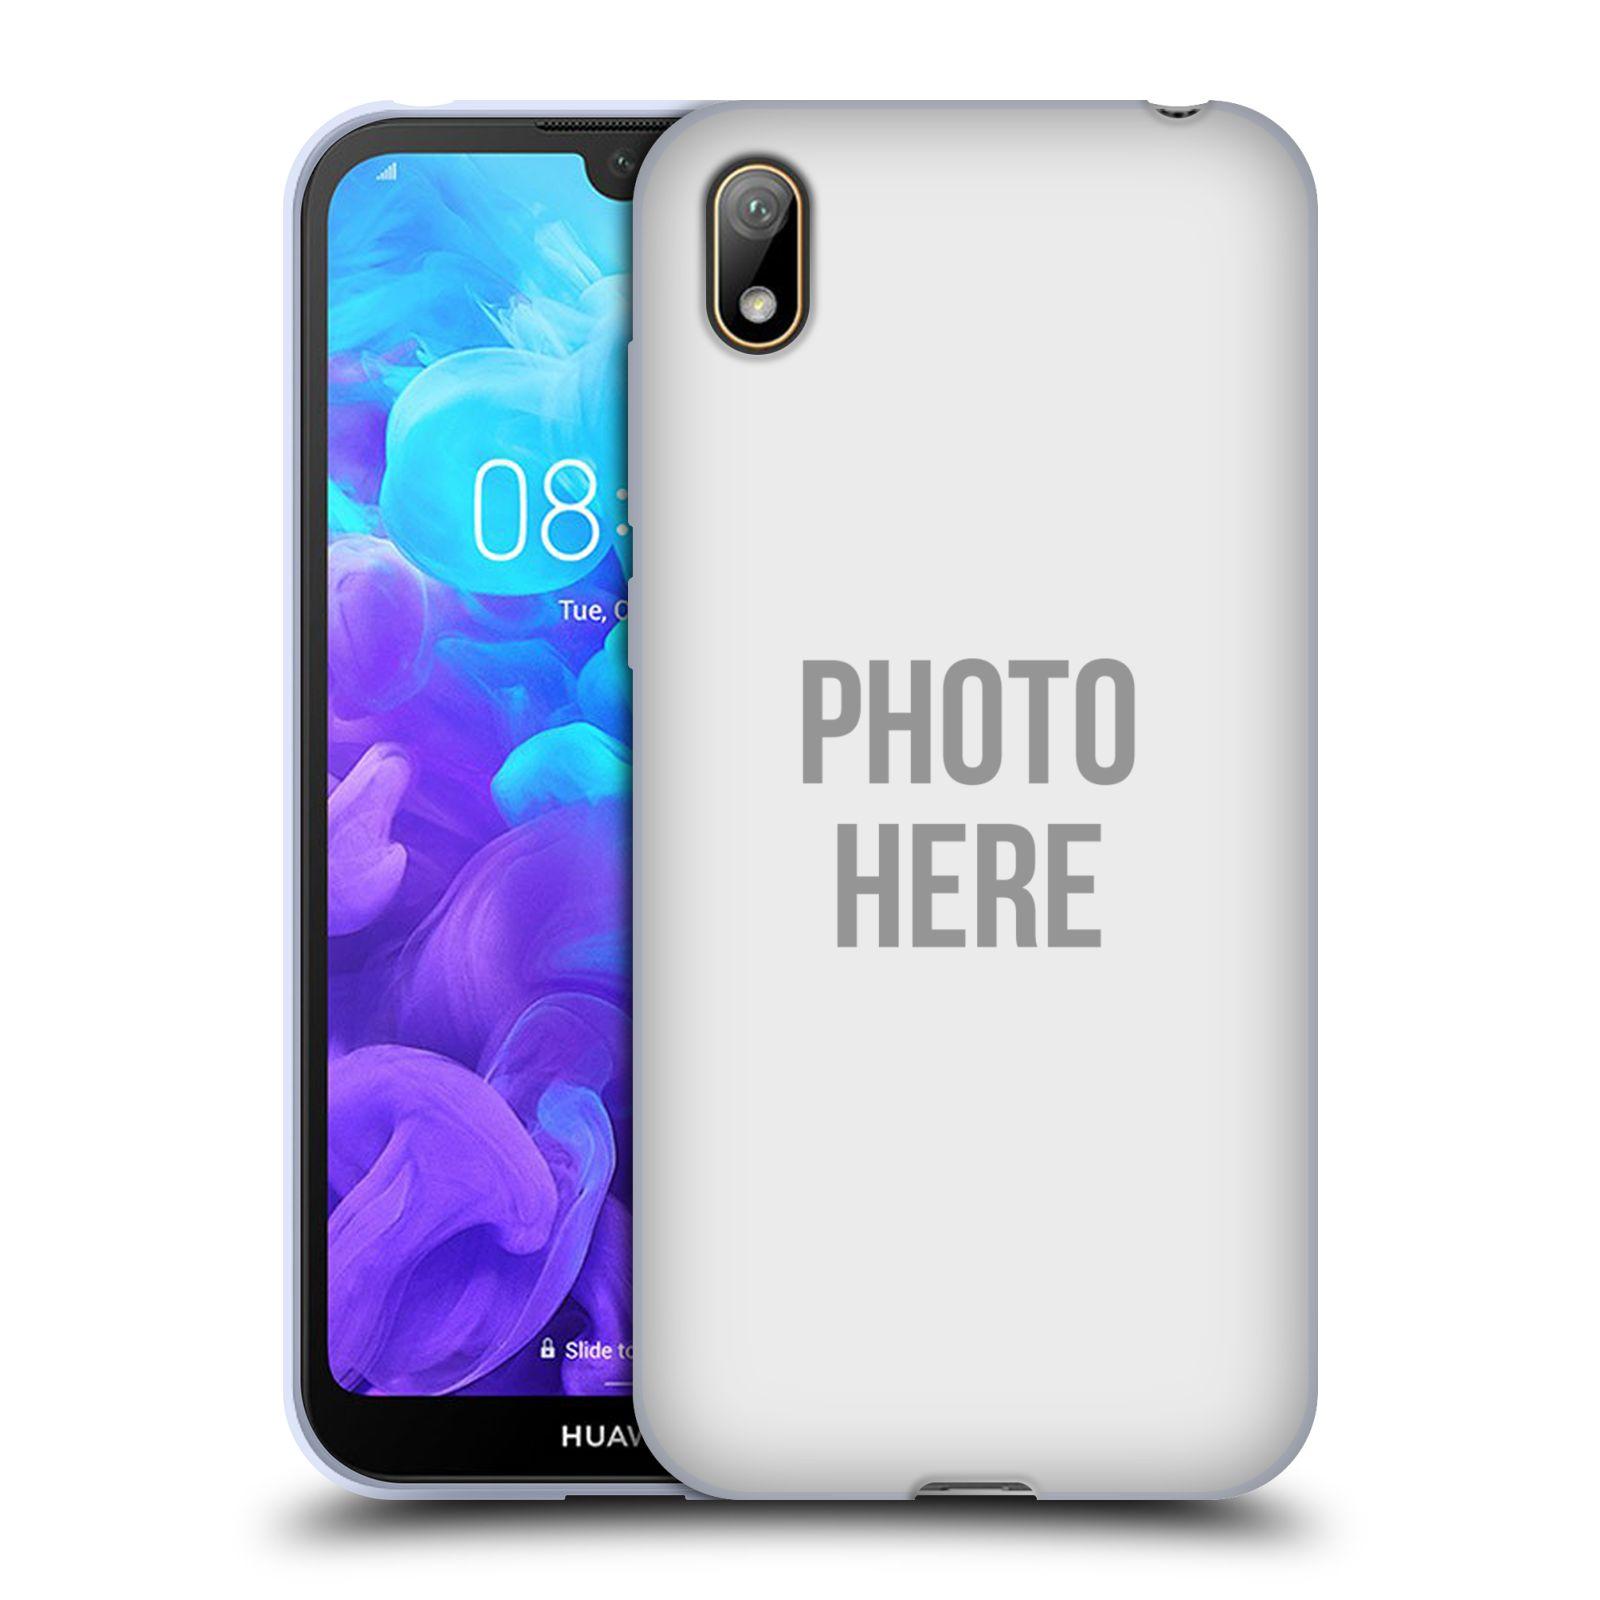 Silikonové pouzdro na mobil Huawei Y5 (2019) - Head Case - s vlastním motivem